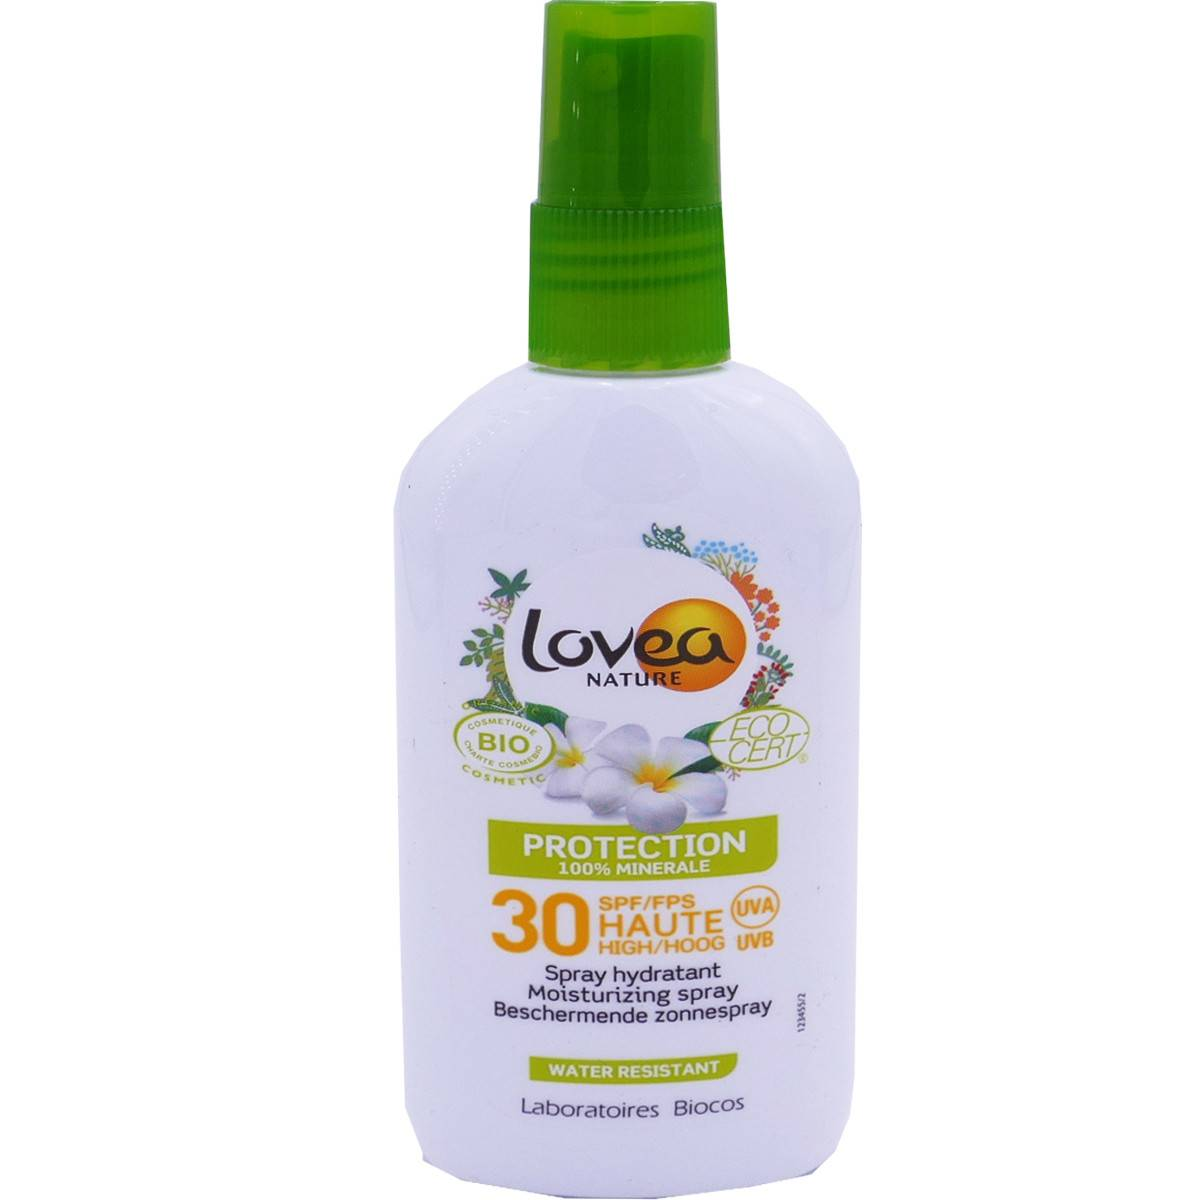 Lovea protection spf 30 bio water resistant